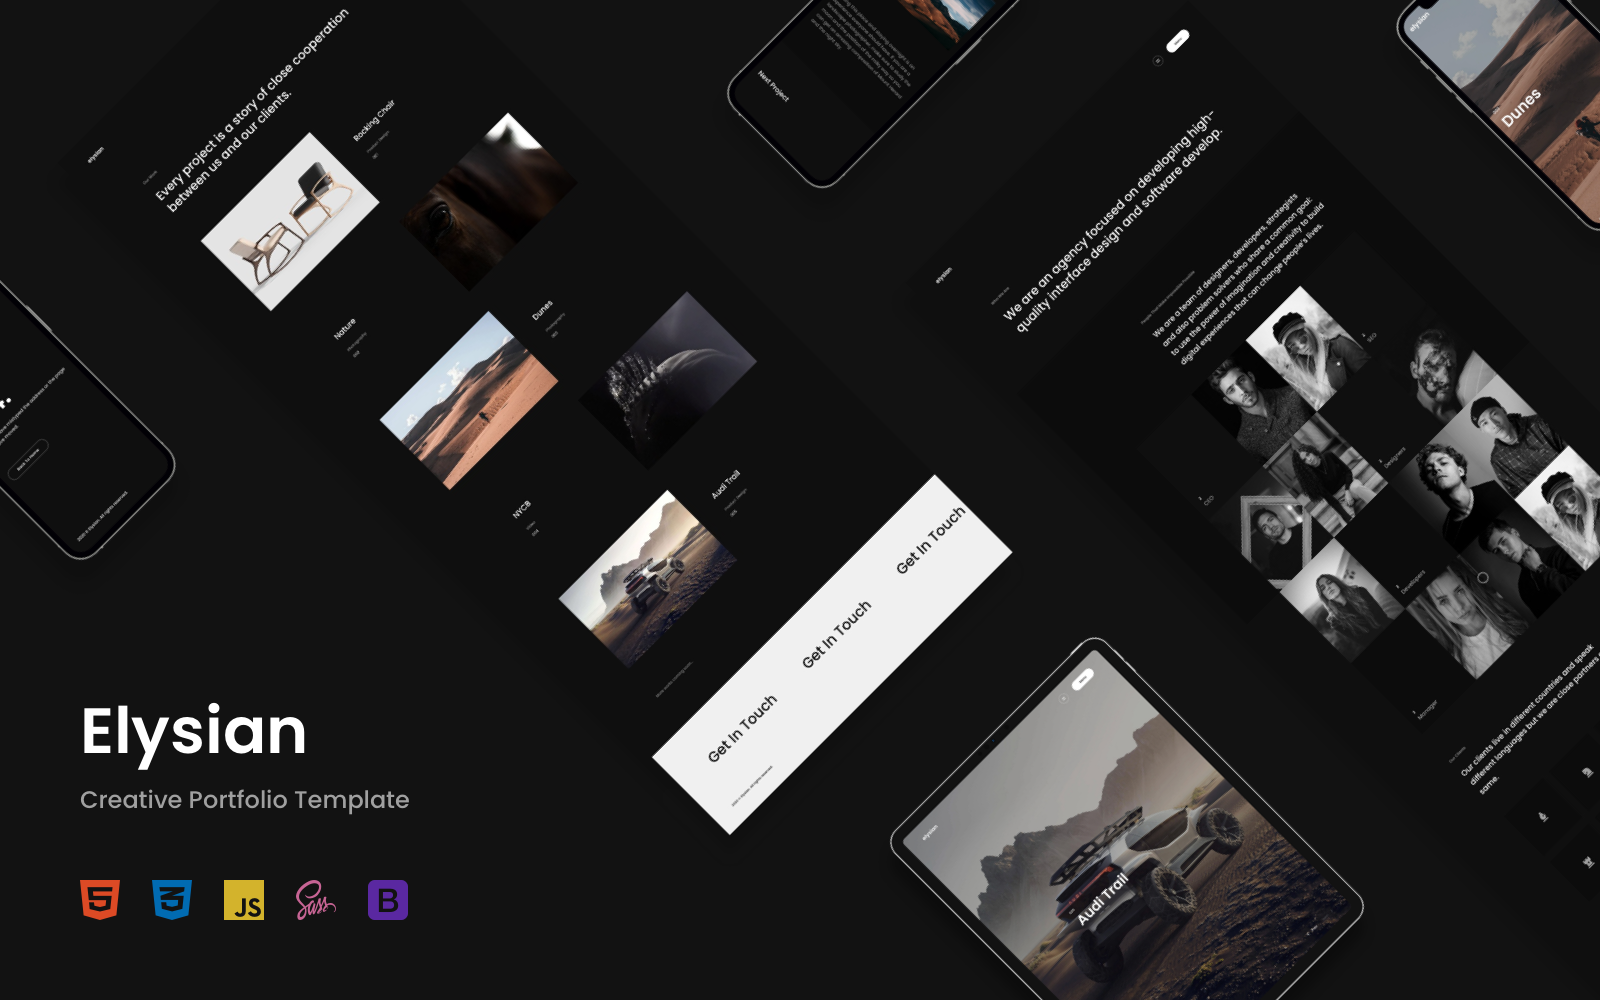 Elysian - Creative Portfolio Templates de Landing Page №137112